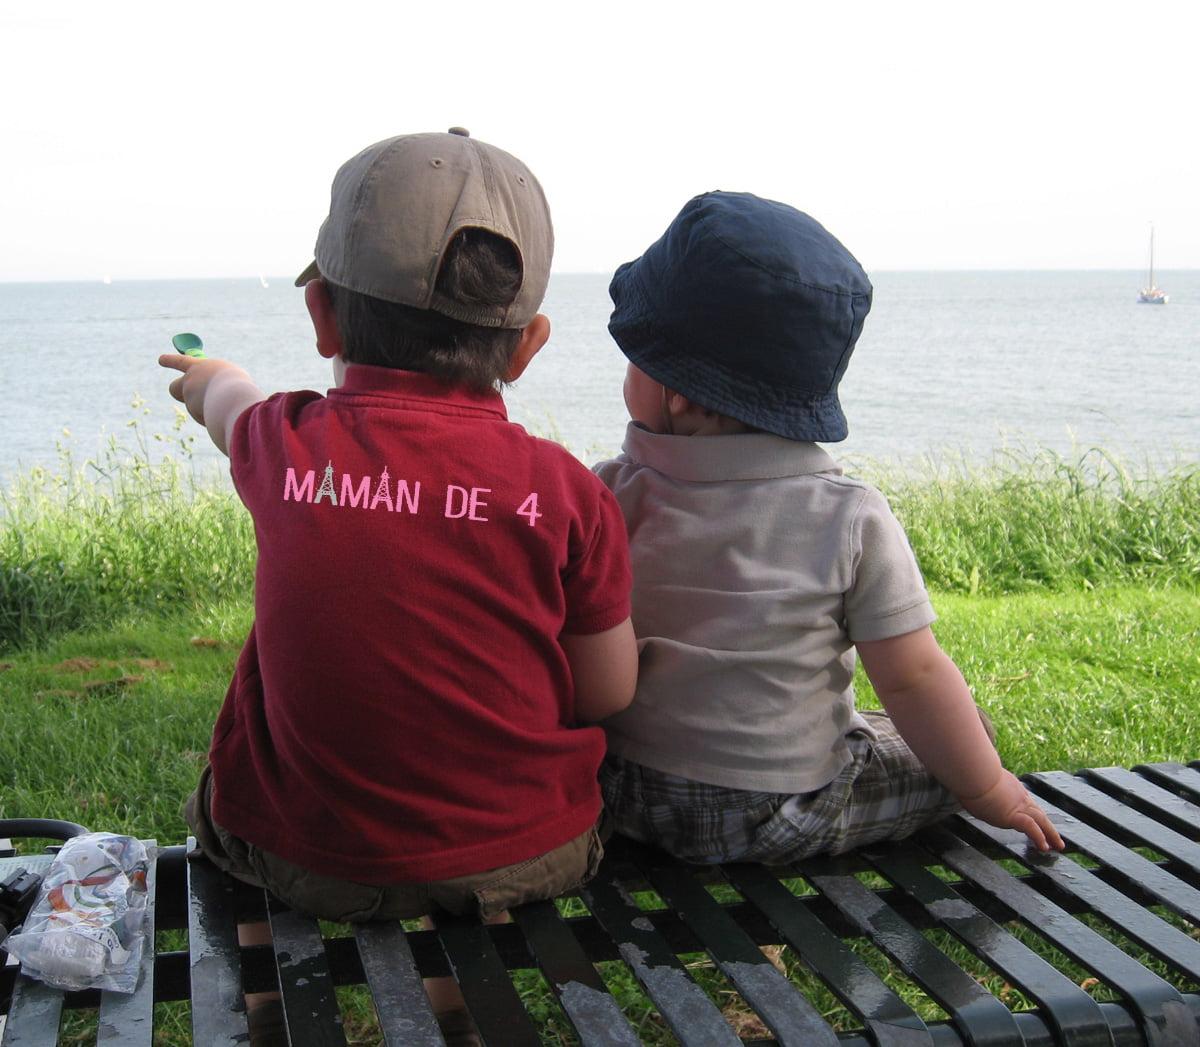 fratrie relation fraternelle